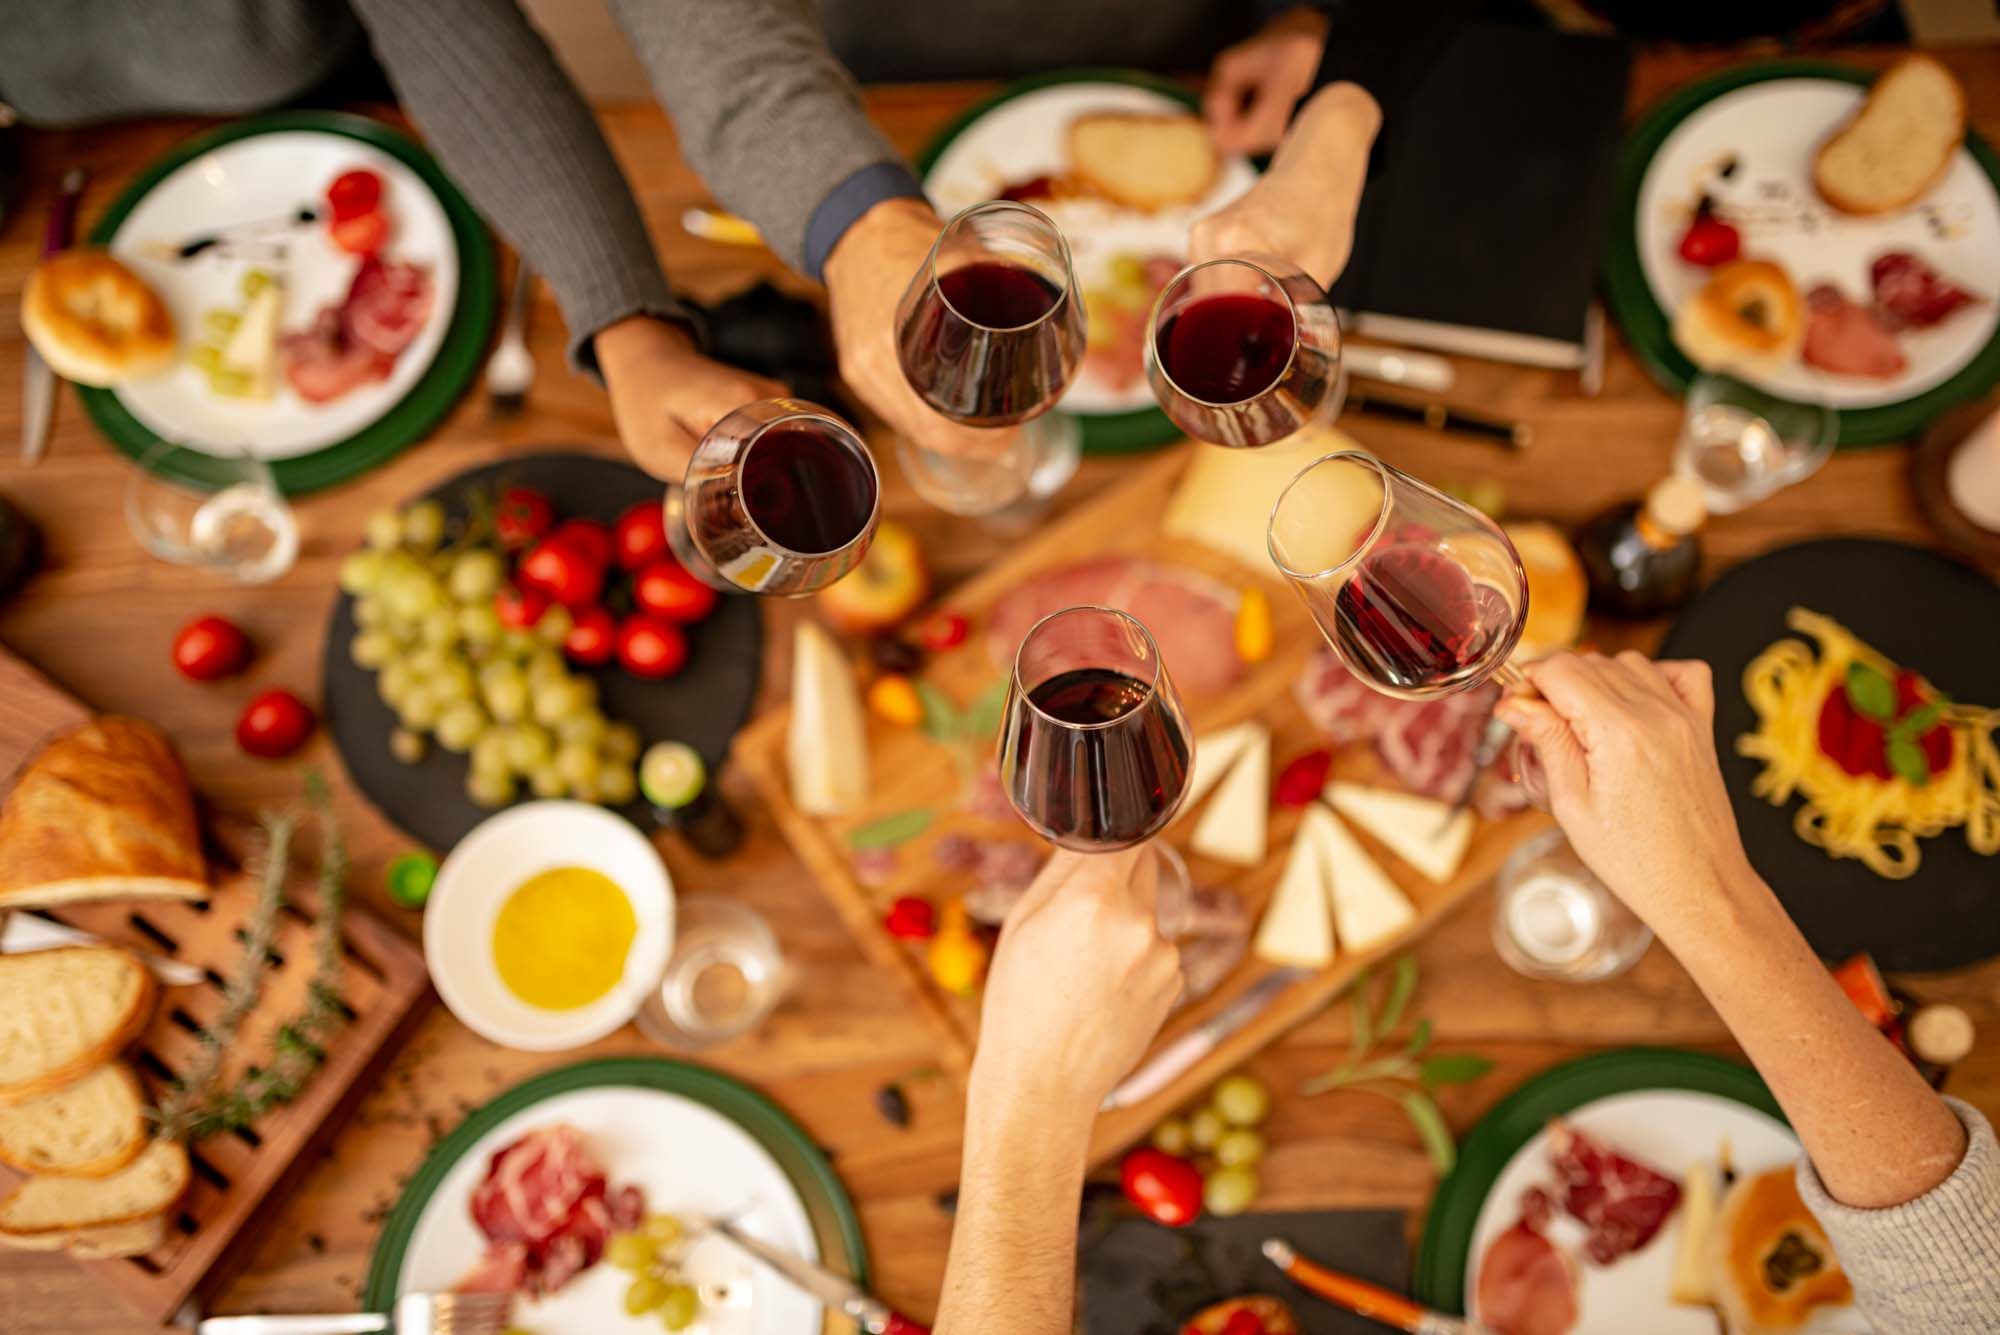 Corsi Di Cucina Eventi Aziendali a Bari